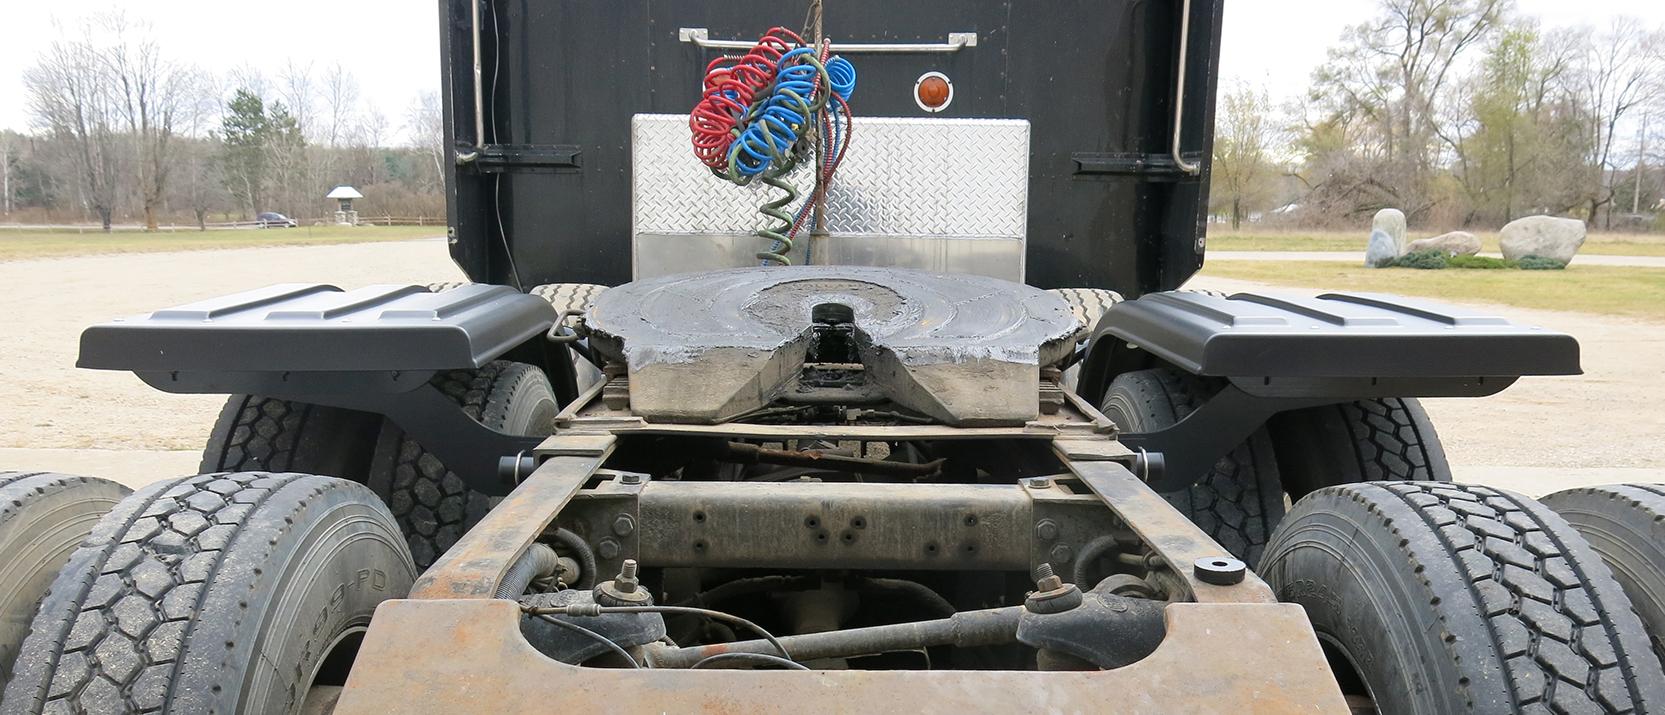 Half Fender Kit - Rear View